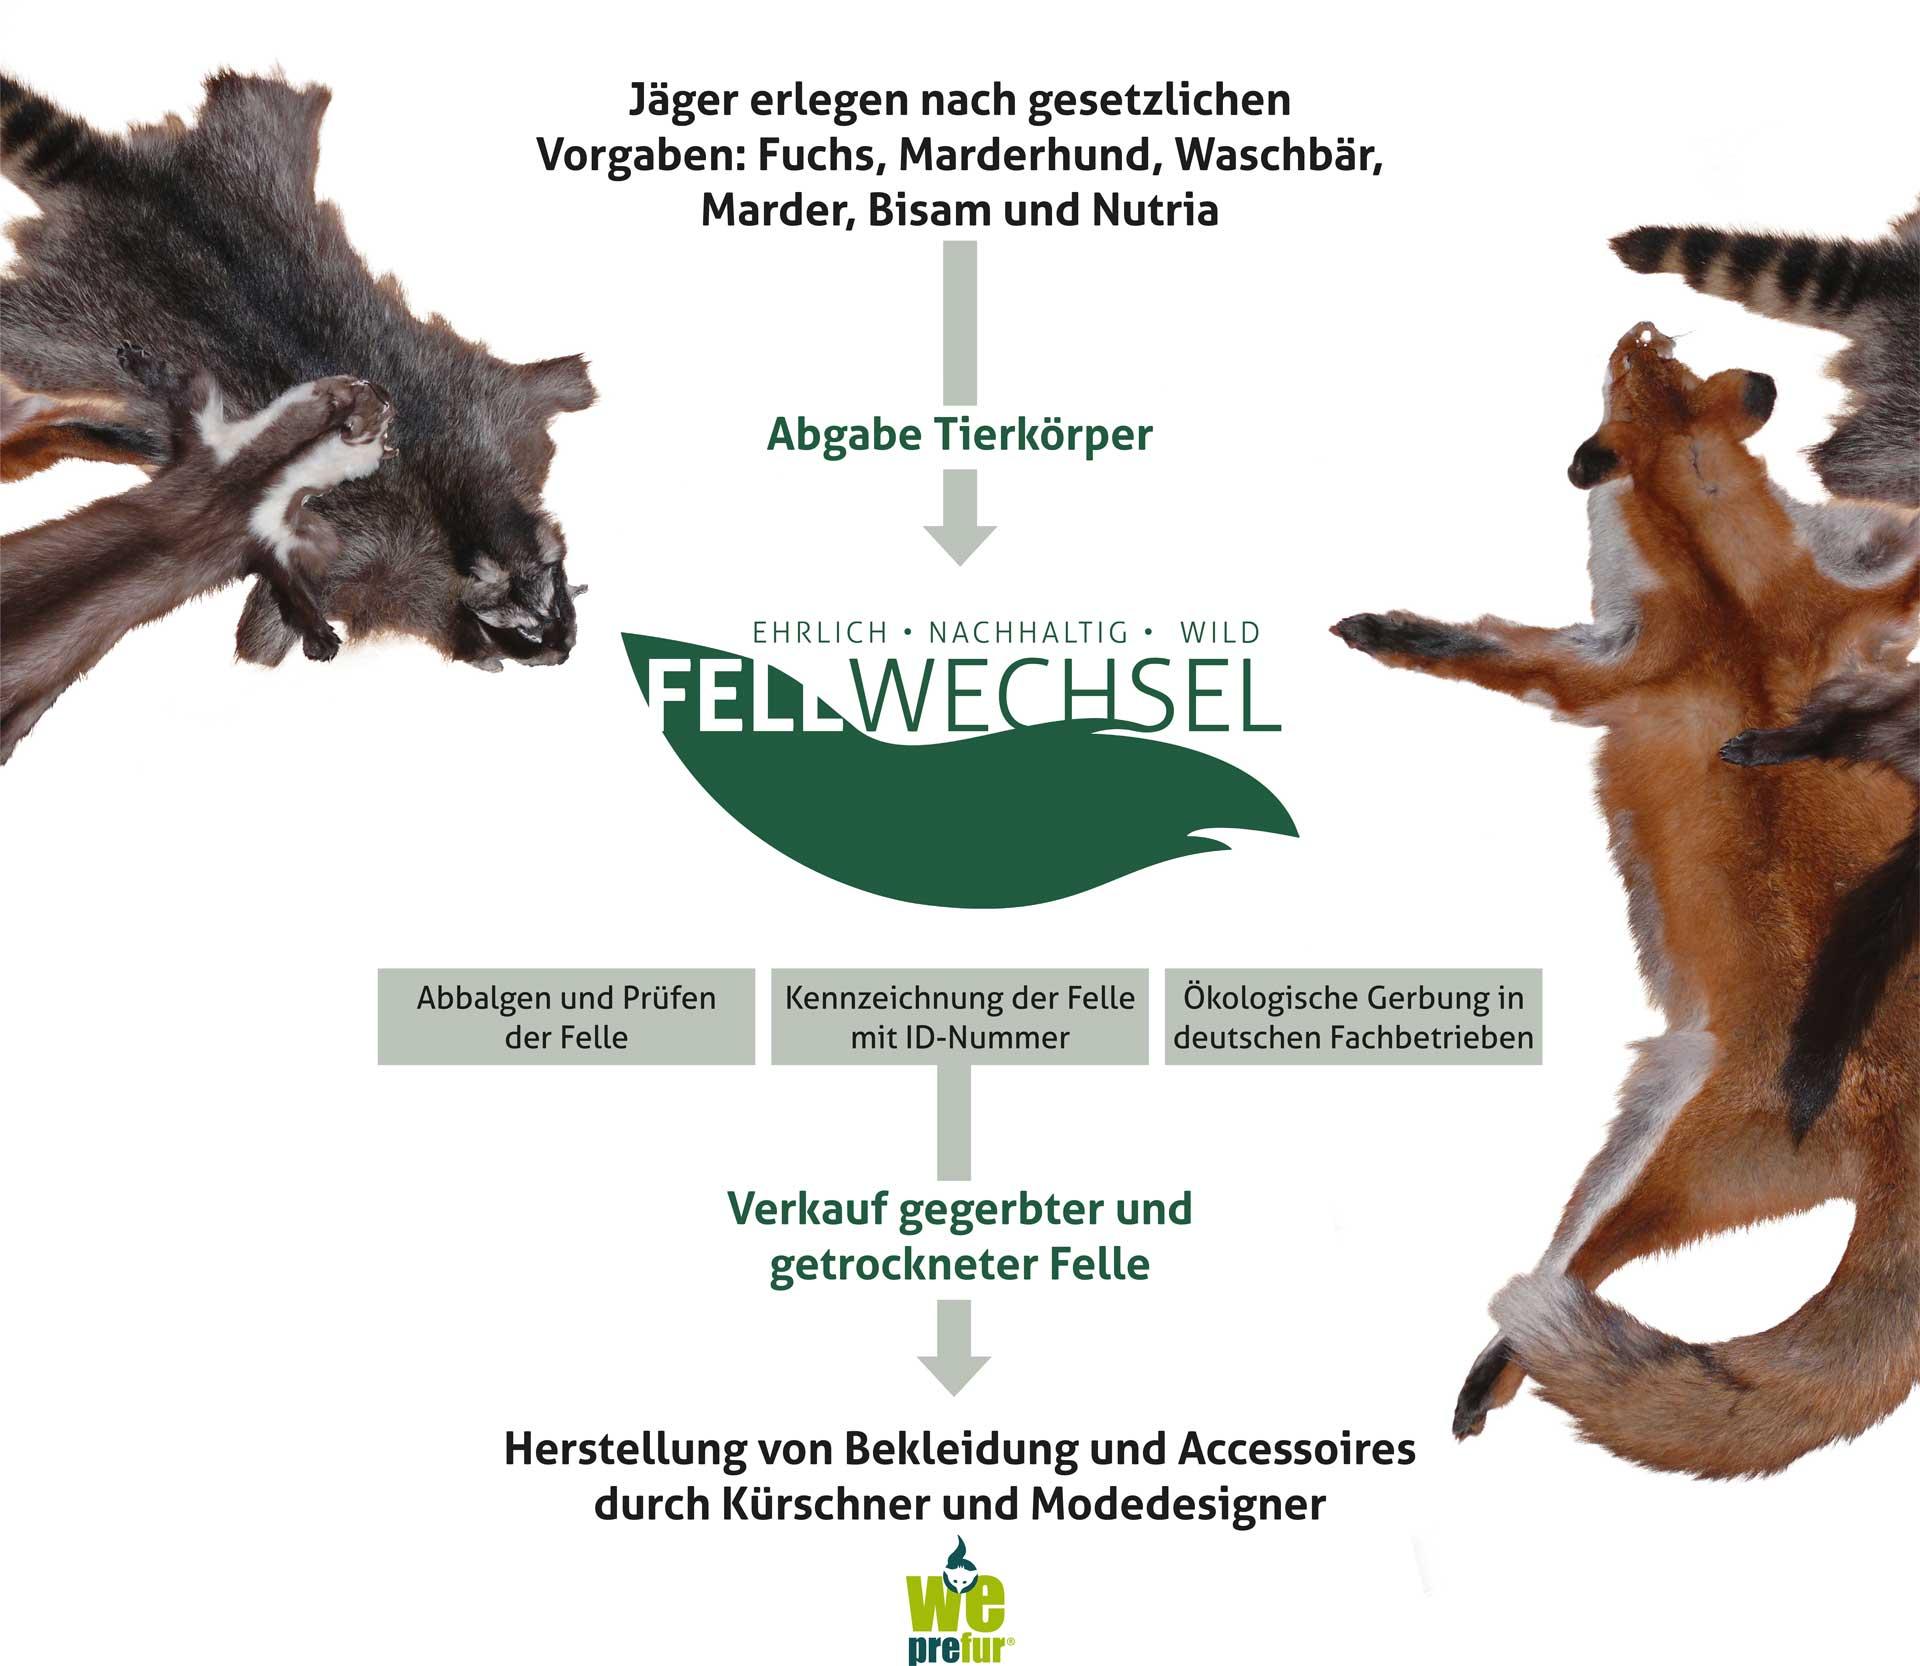 Wie funktioniert die Fellwechsel GmbH?